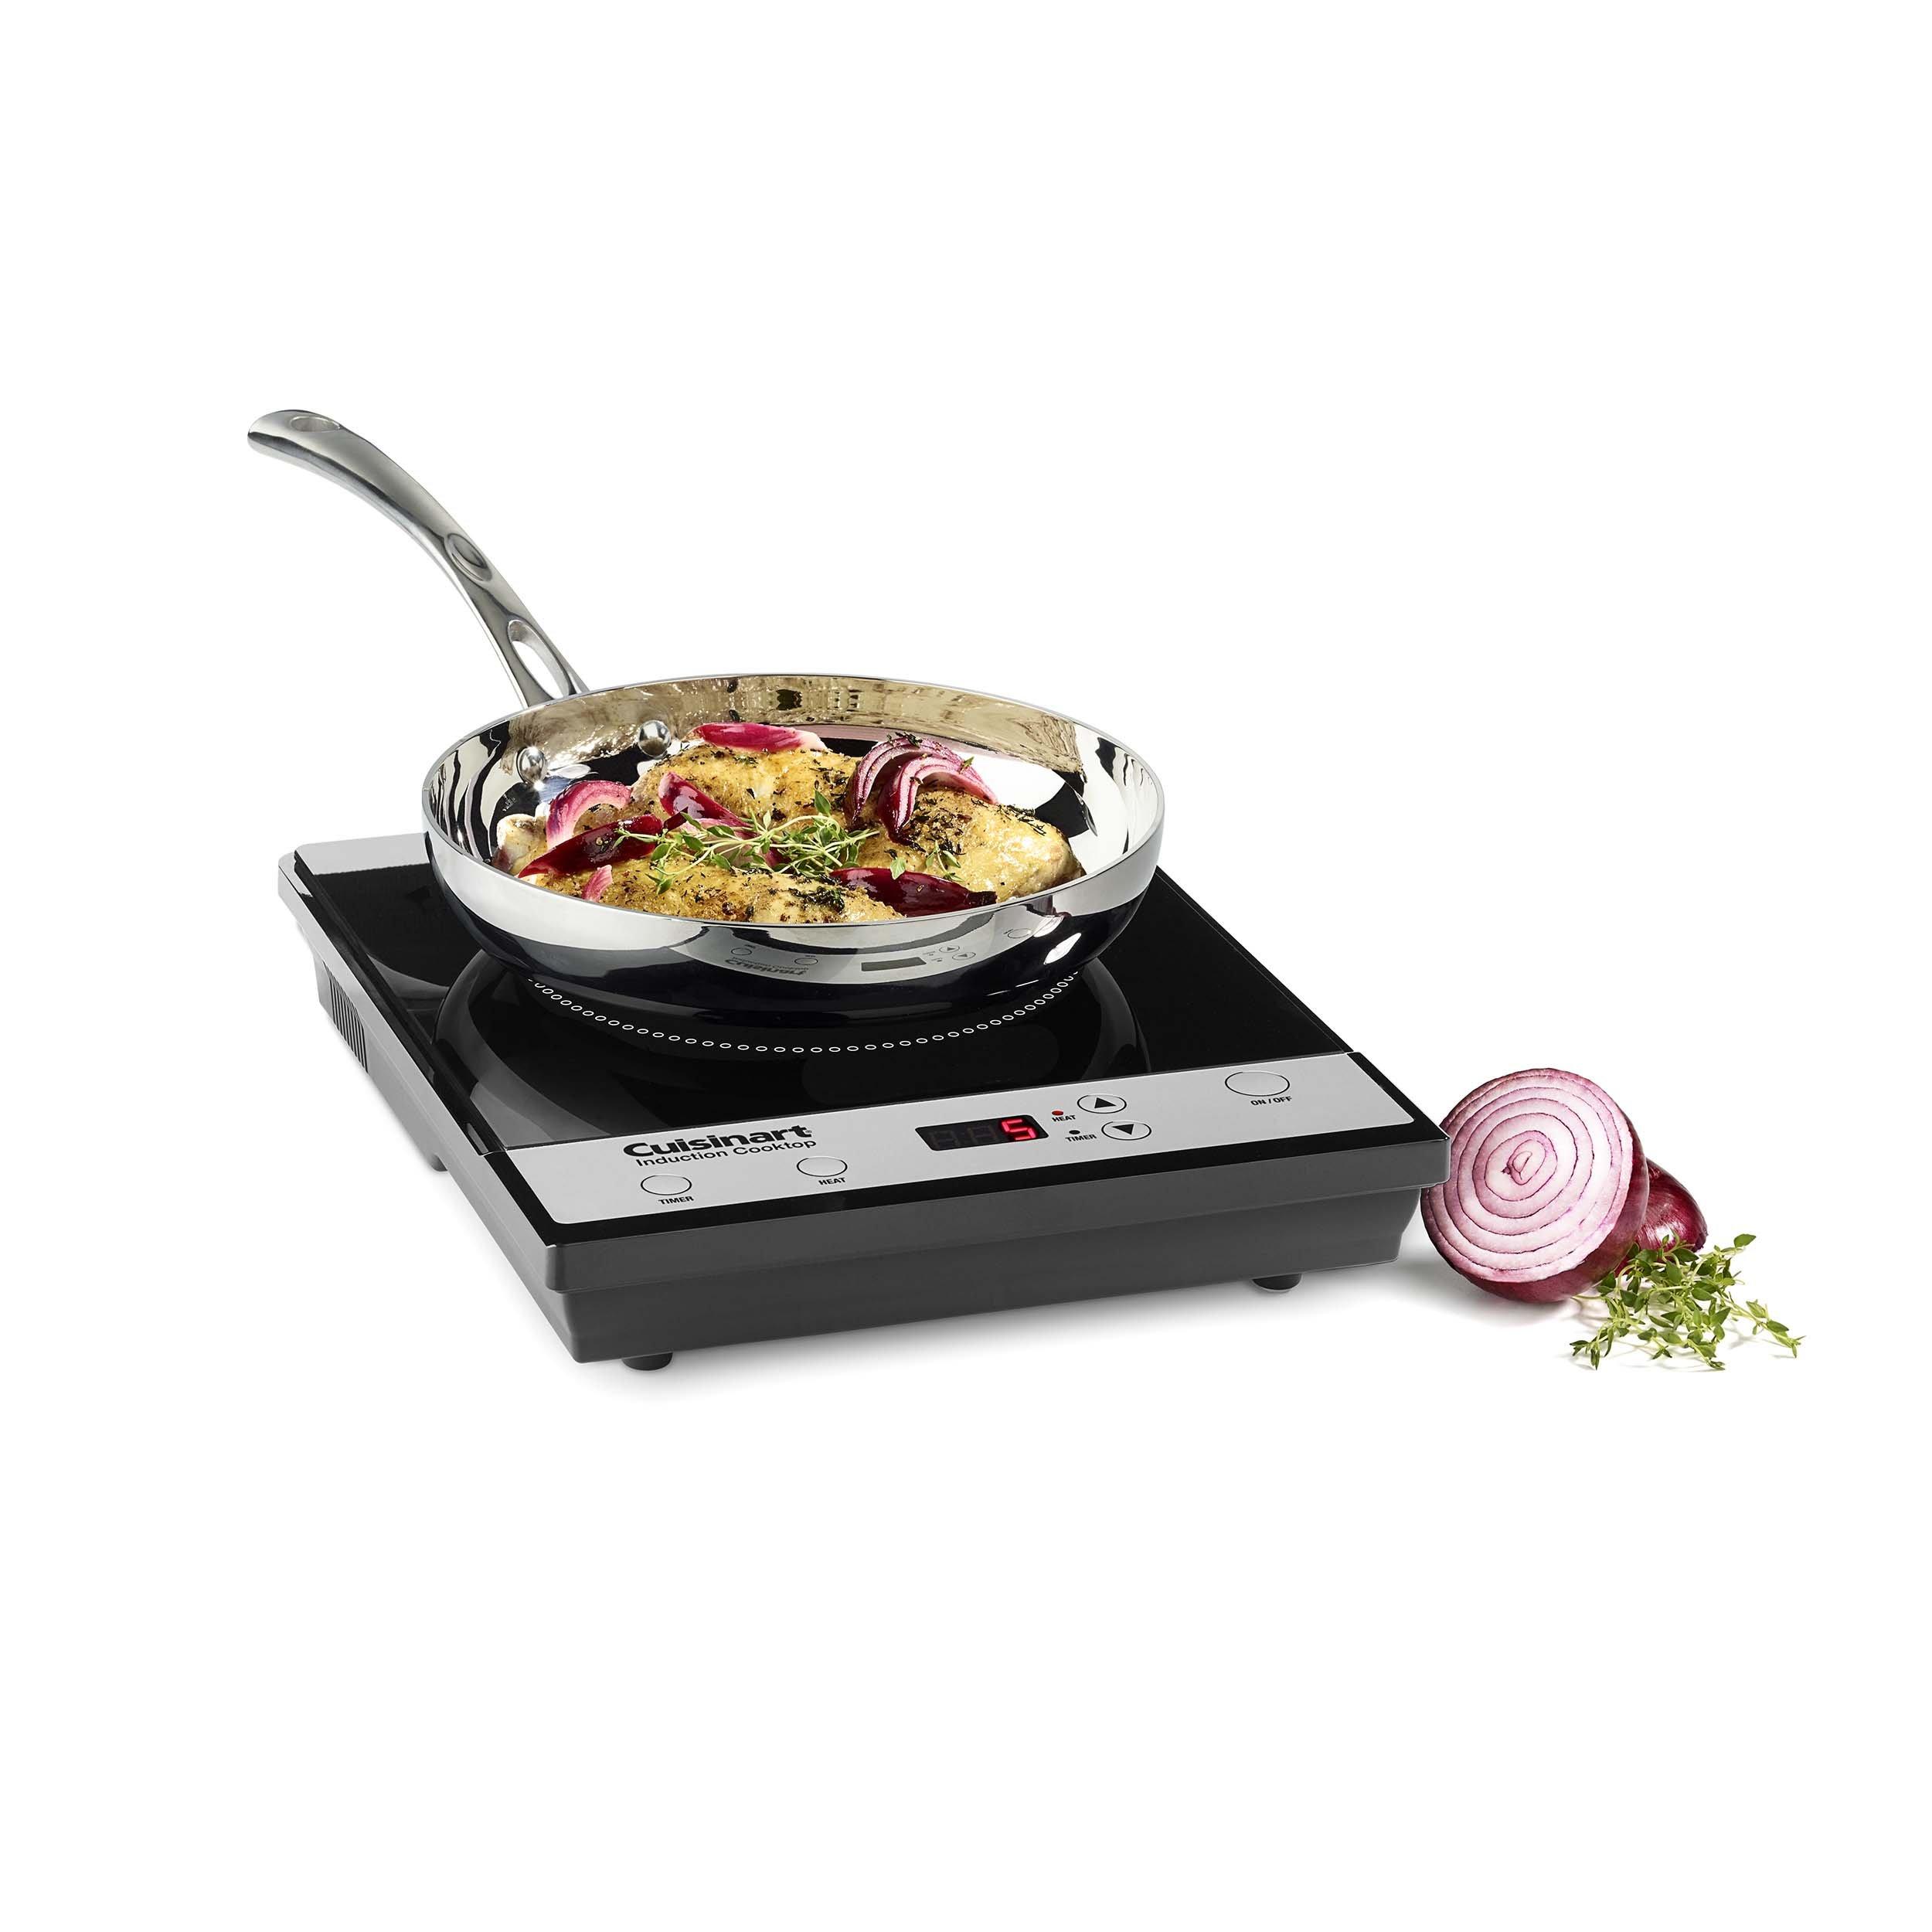 Cuisinart ICT-30 Induction Cooktop, Black